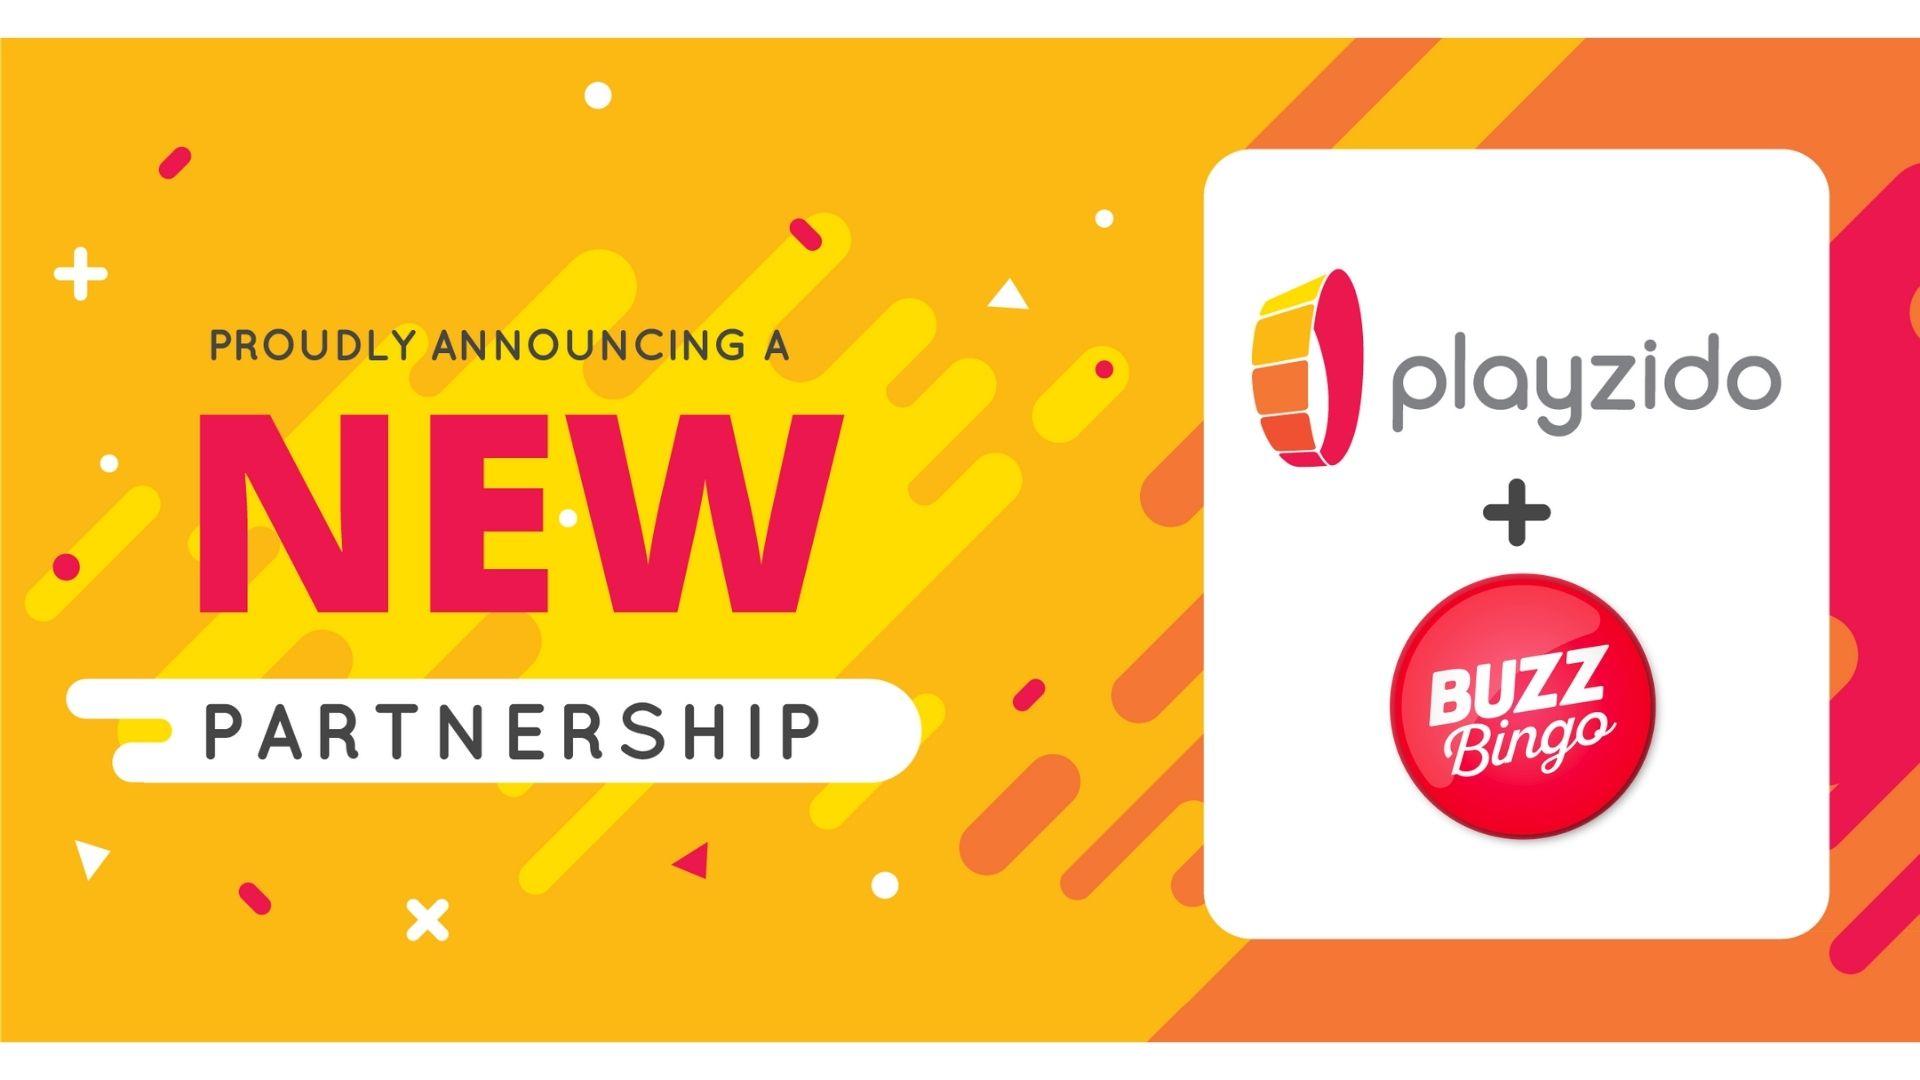 Playzido kick-off Playtech integration with Buzz Bingo launch